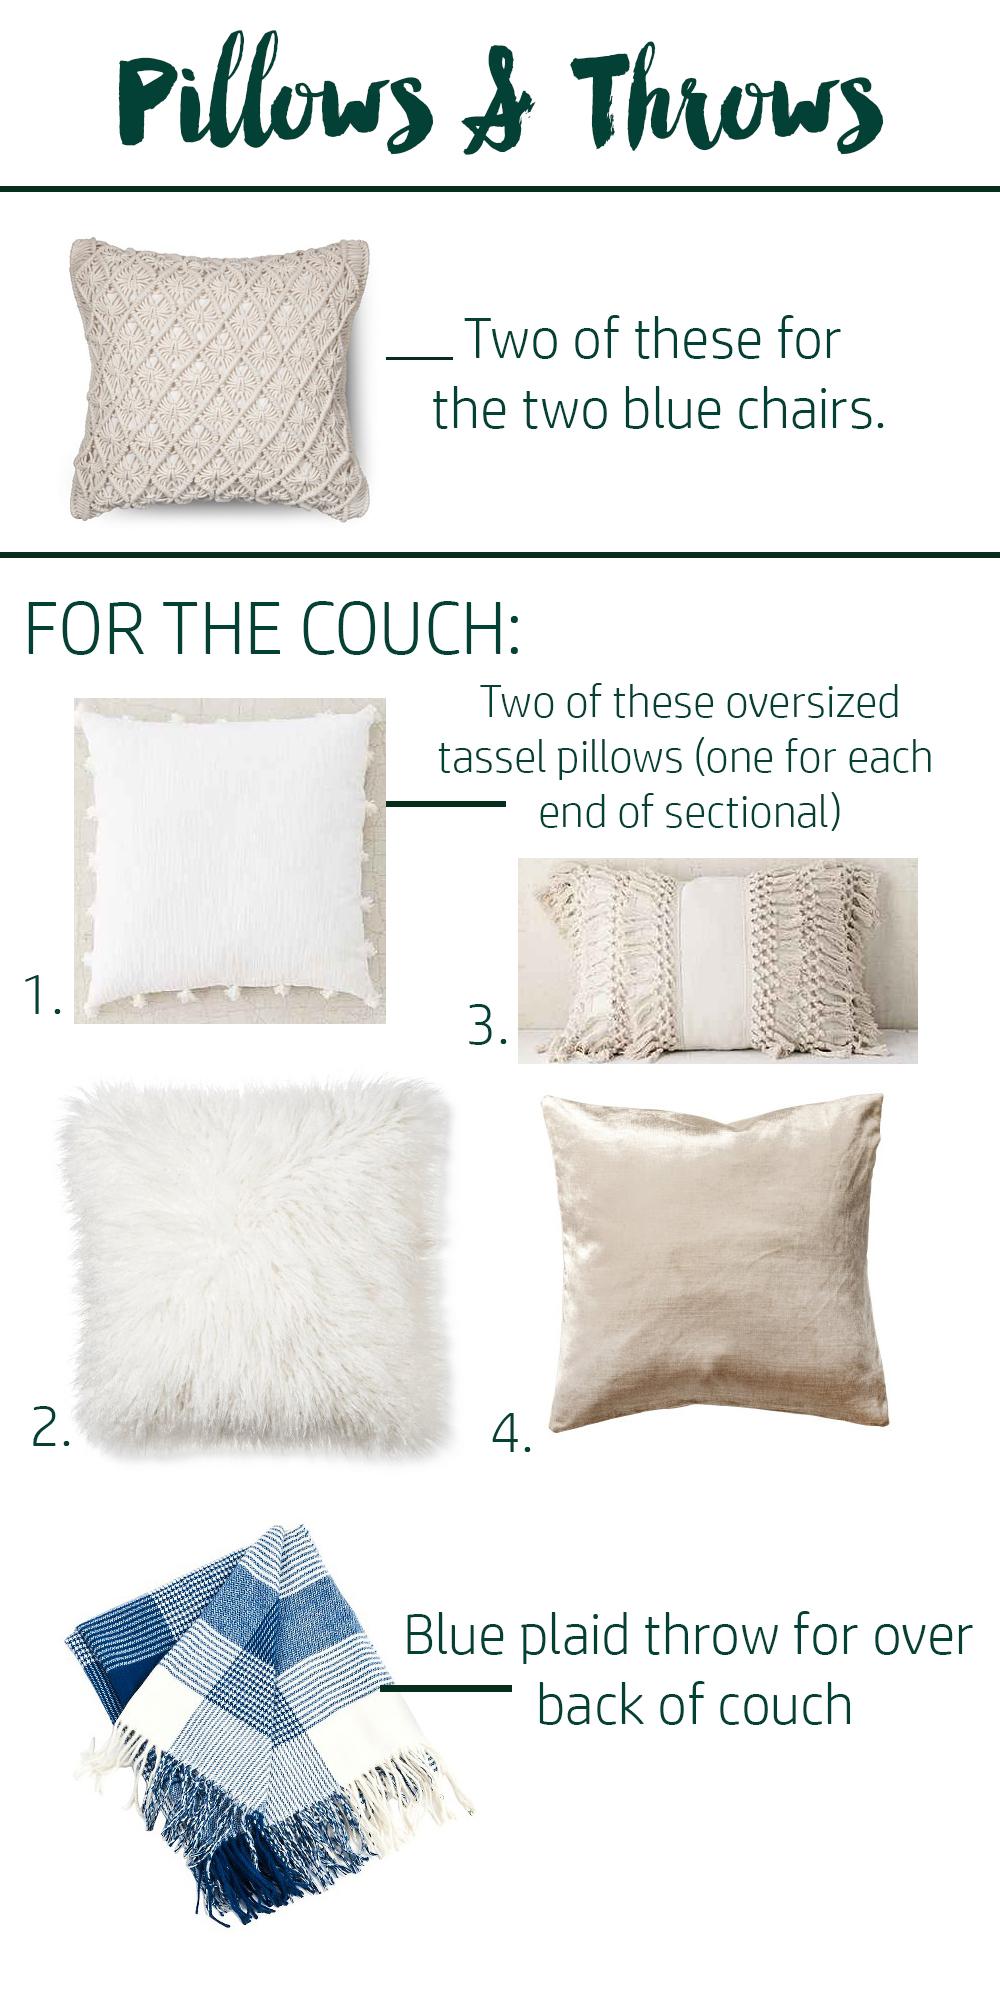 pillows & accessories